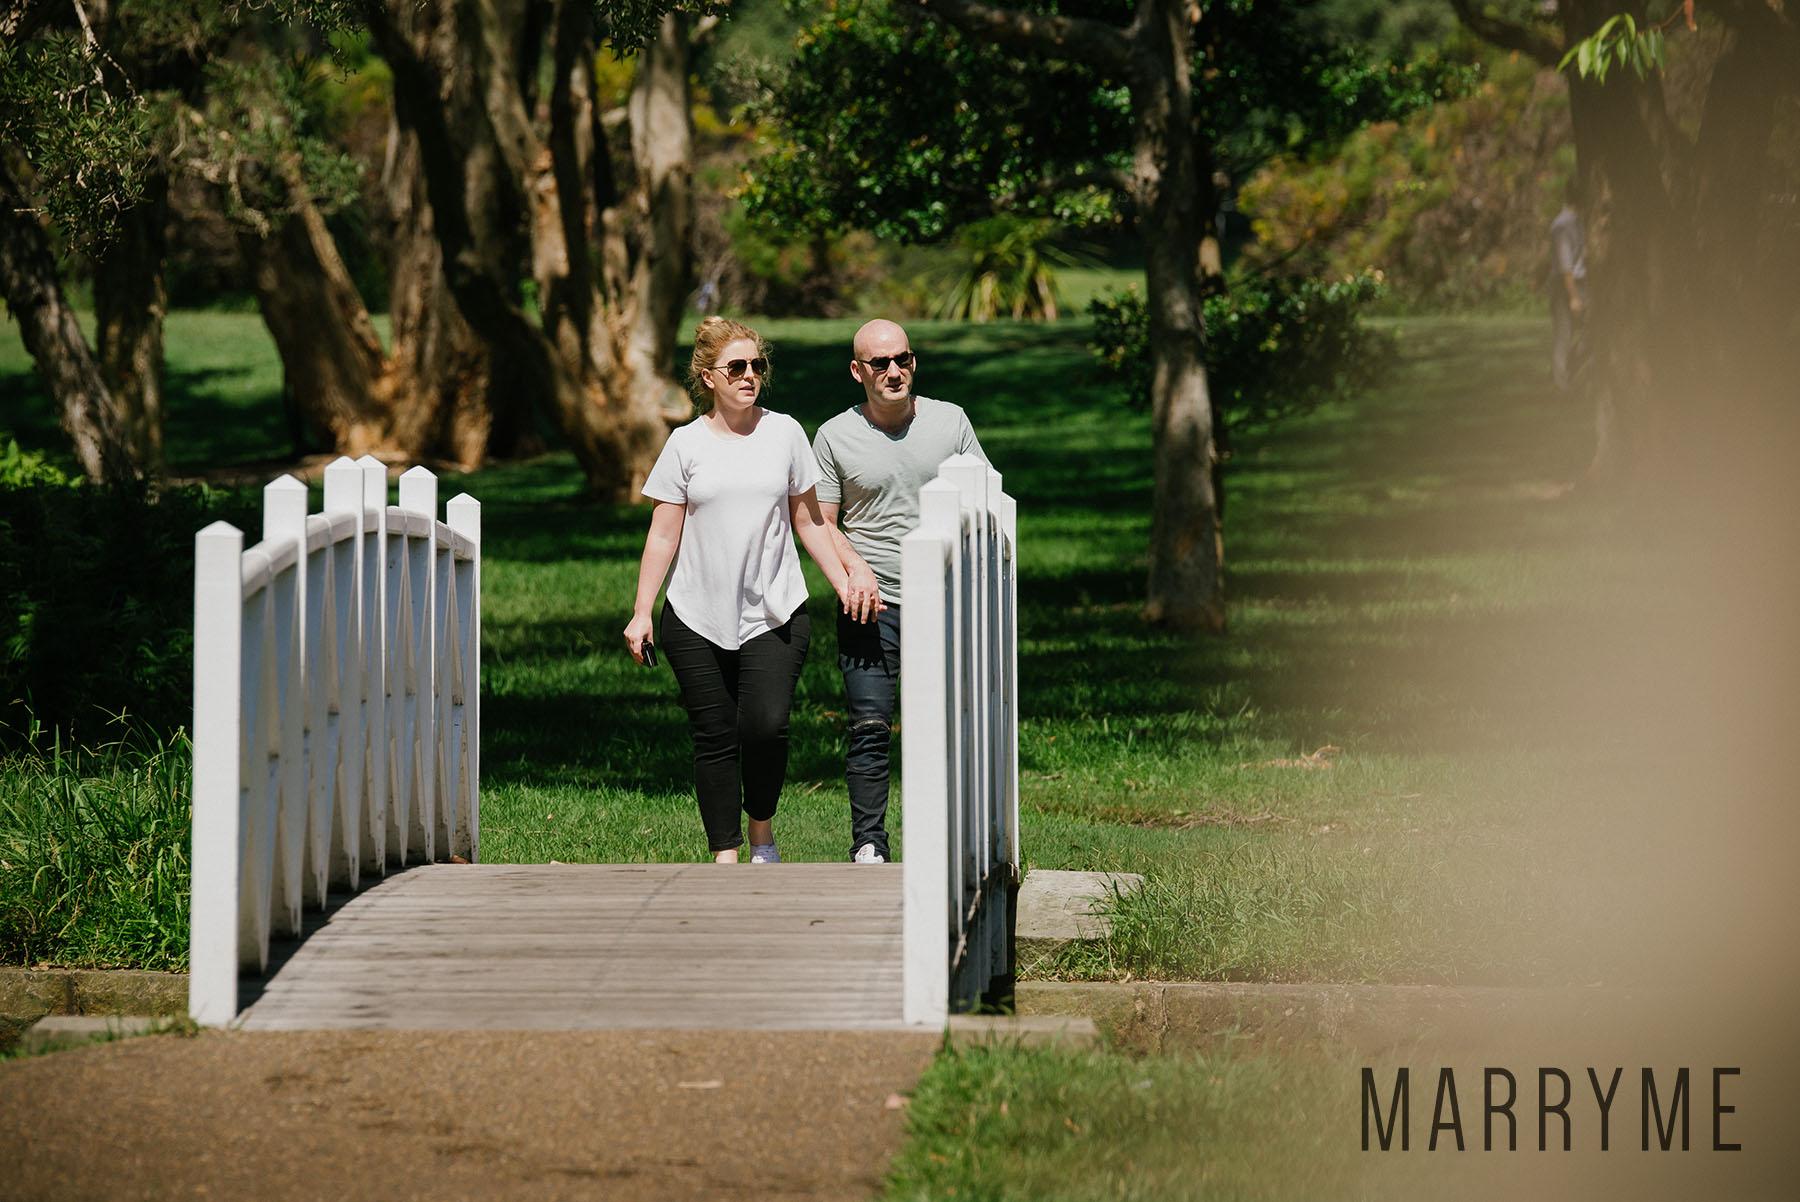 4_Centennial_Park_Parklands_marriage_proposal_sydney_marryme.jpg